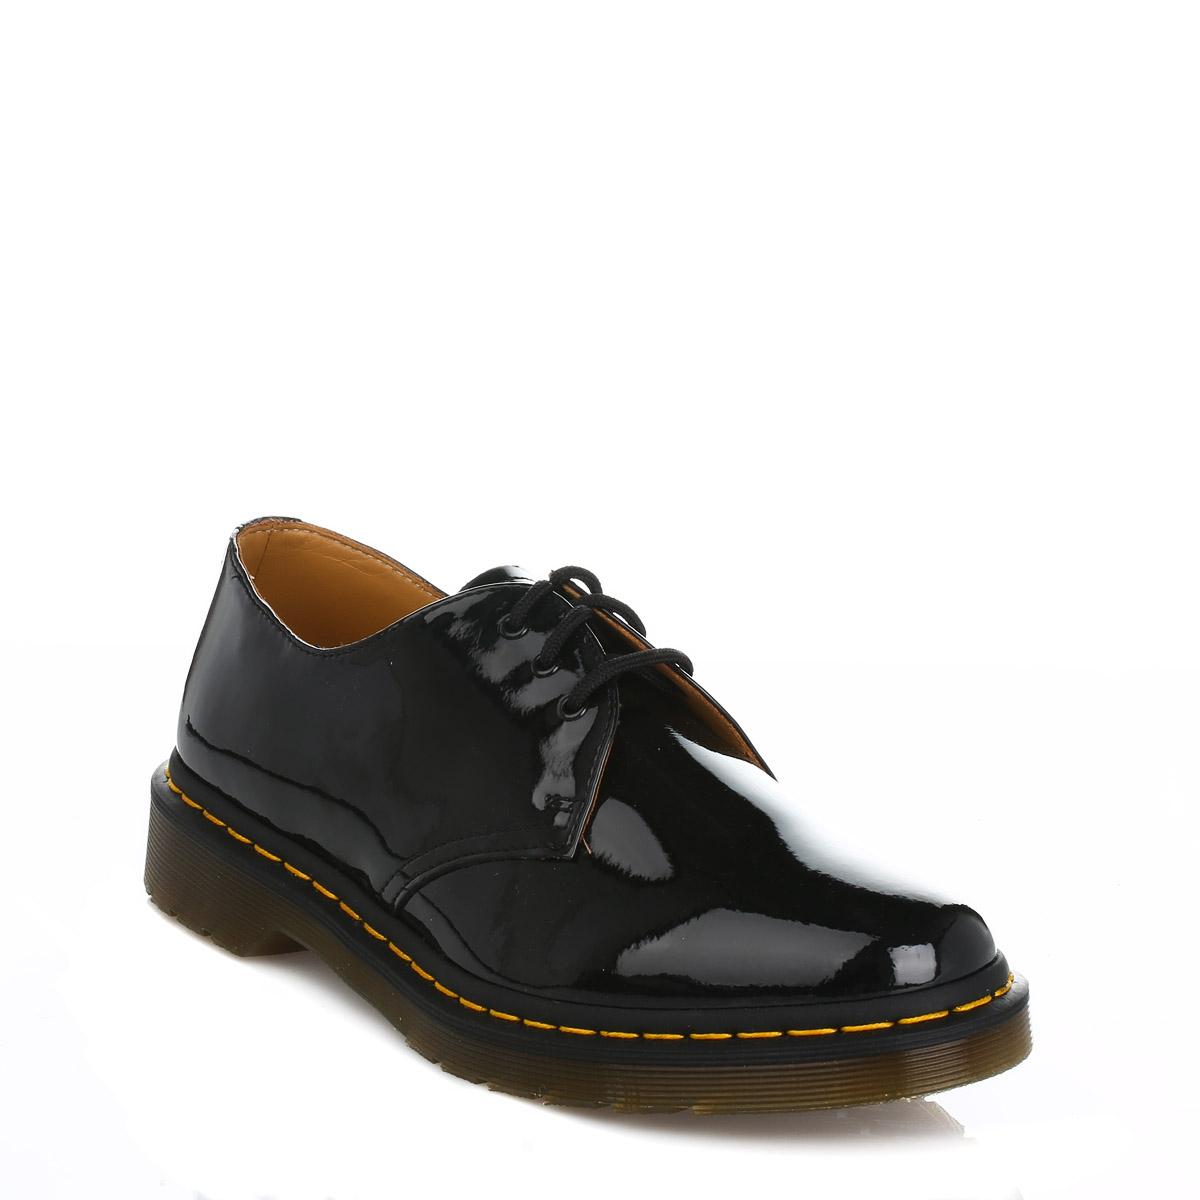 597012b7f07 Details about Dr. Martens Womens Black 1461 Derby Shoes